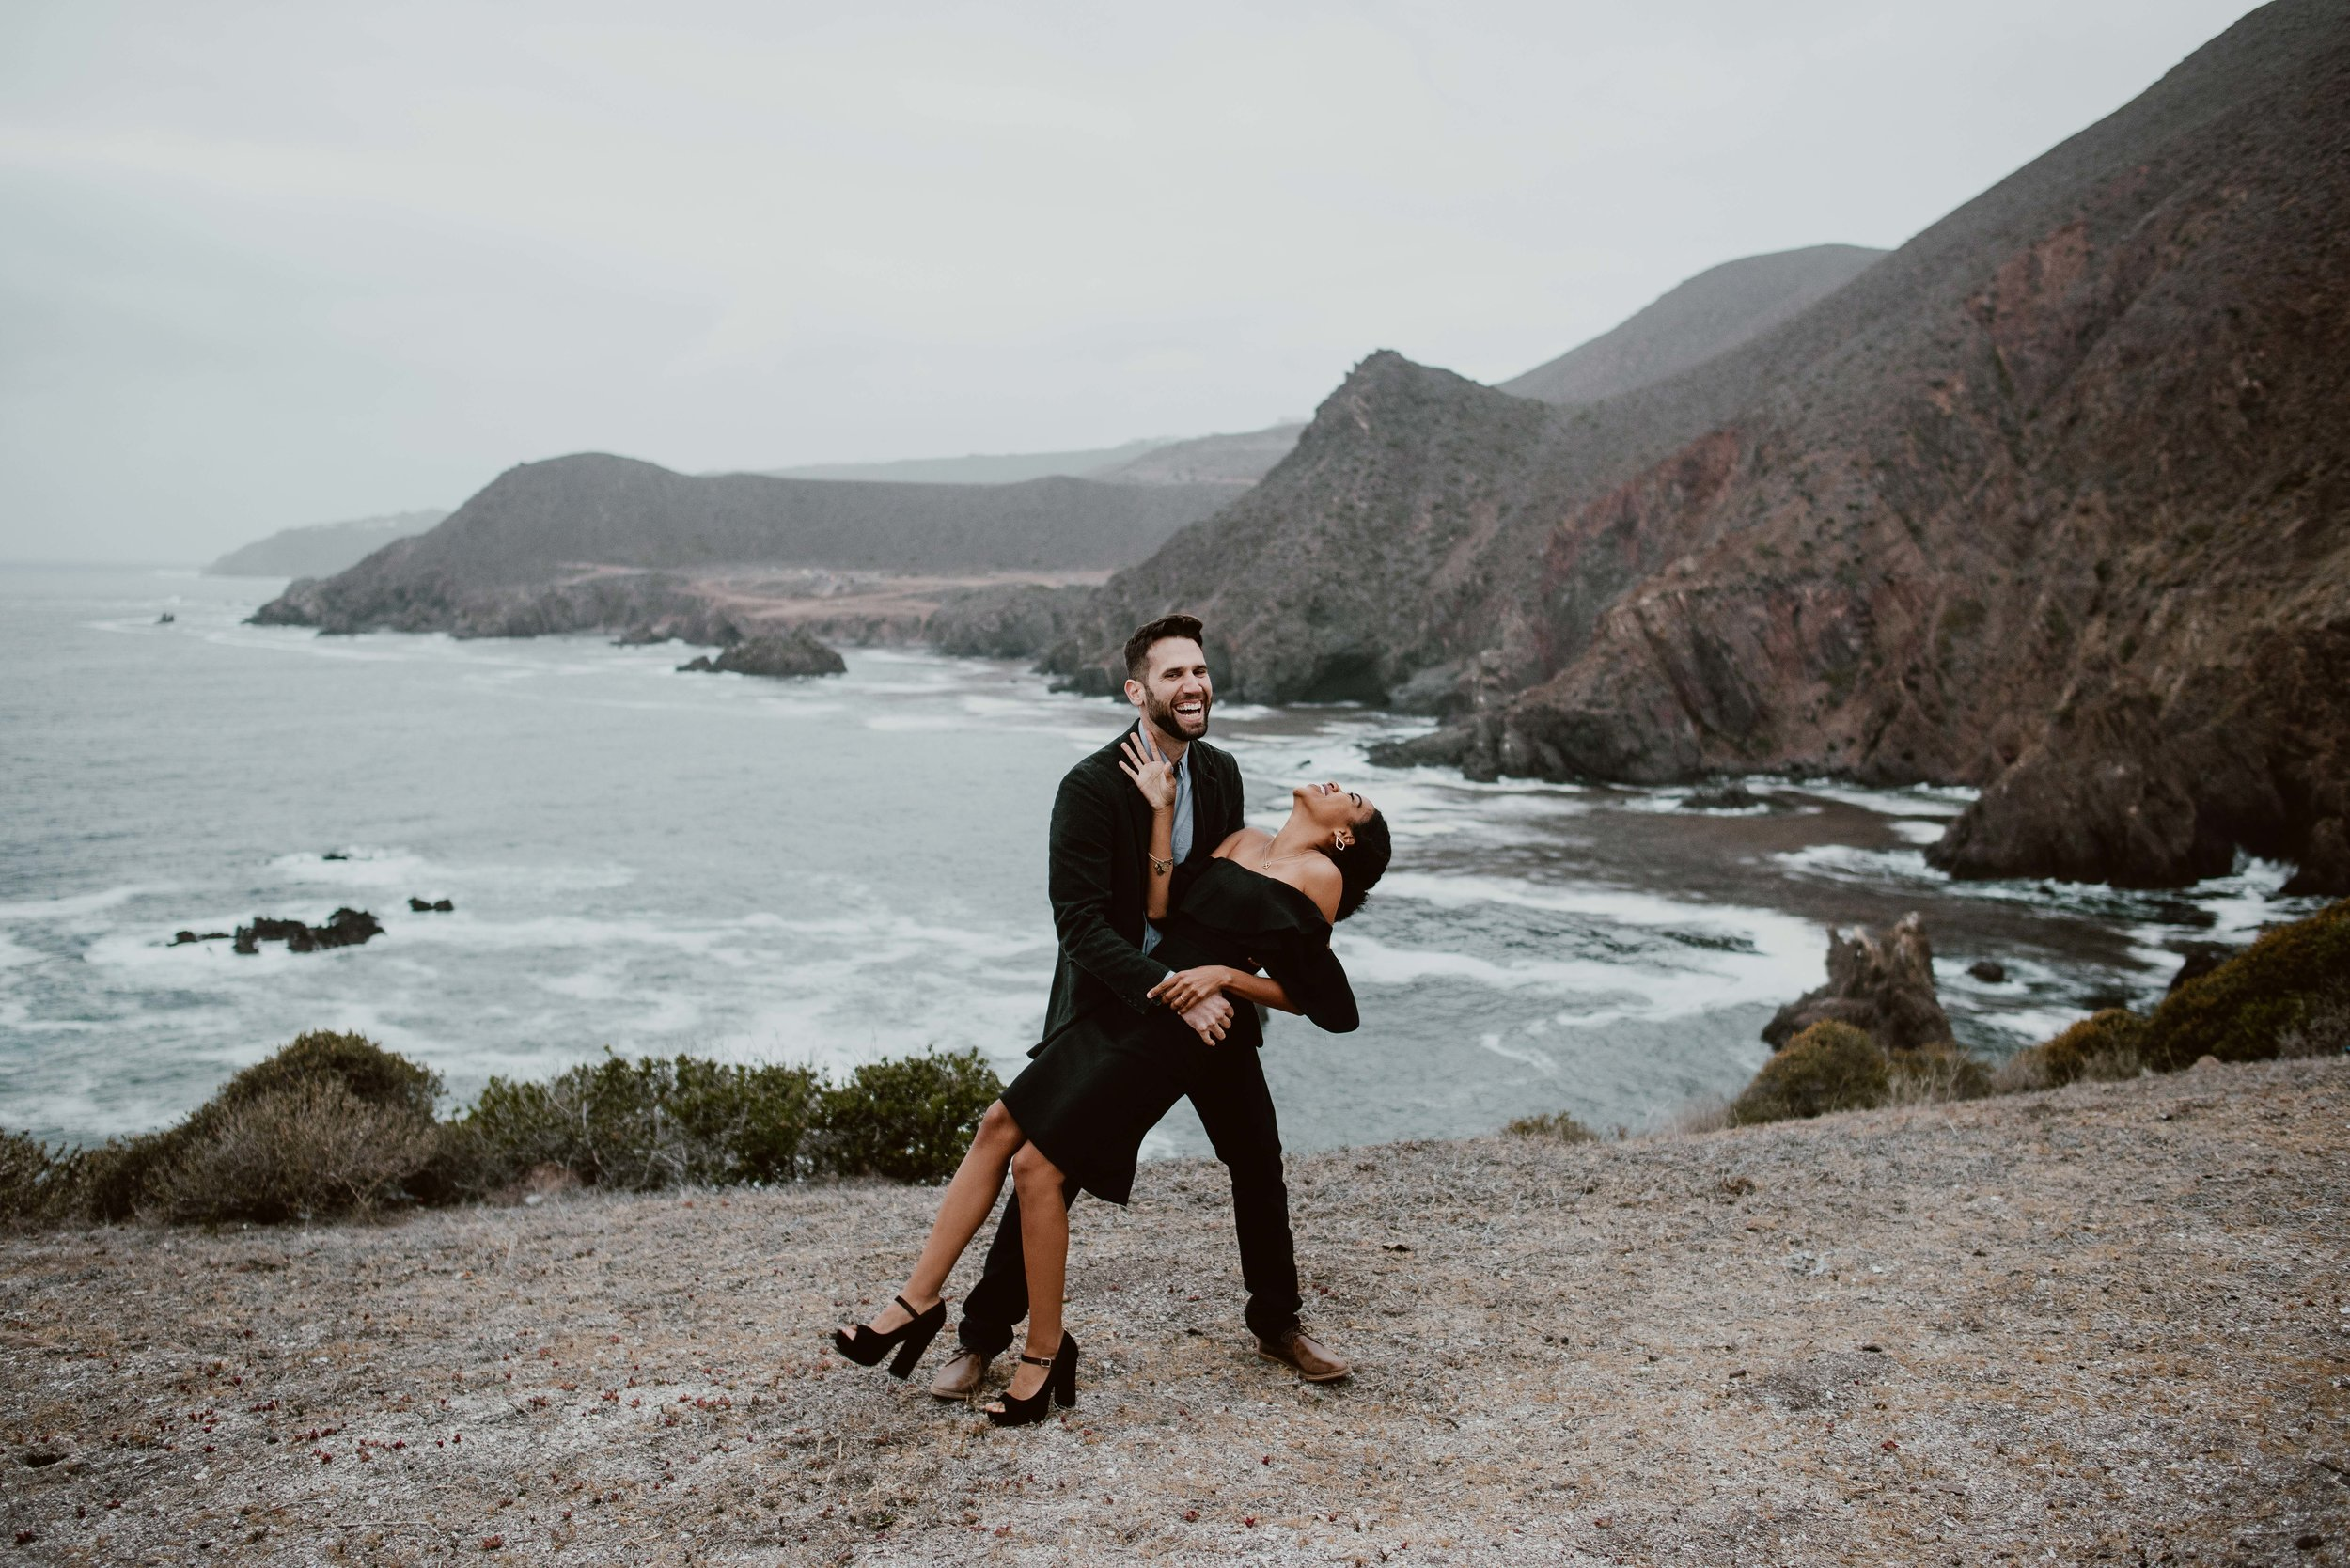 Nathalie+Carlin Engagement-60.jpg